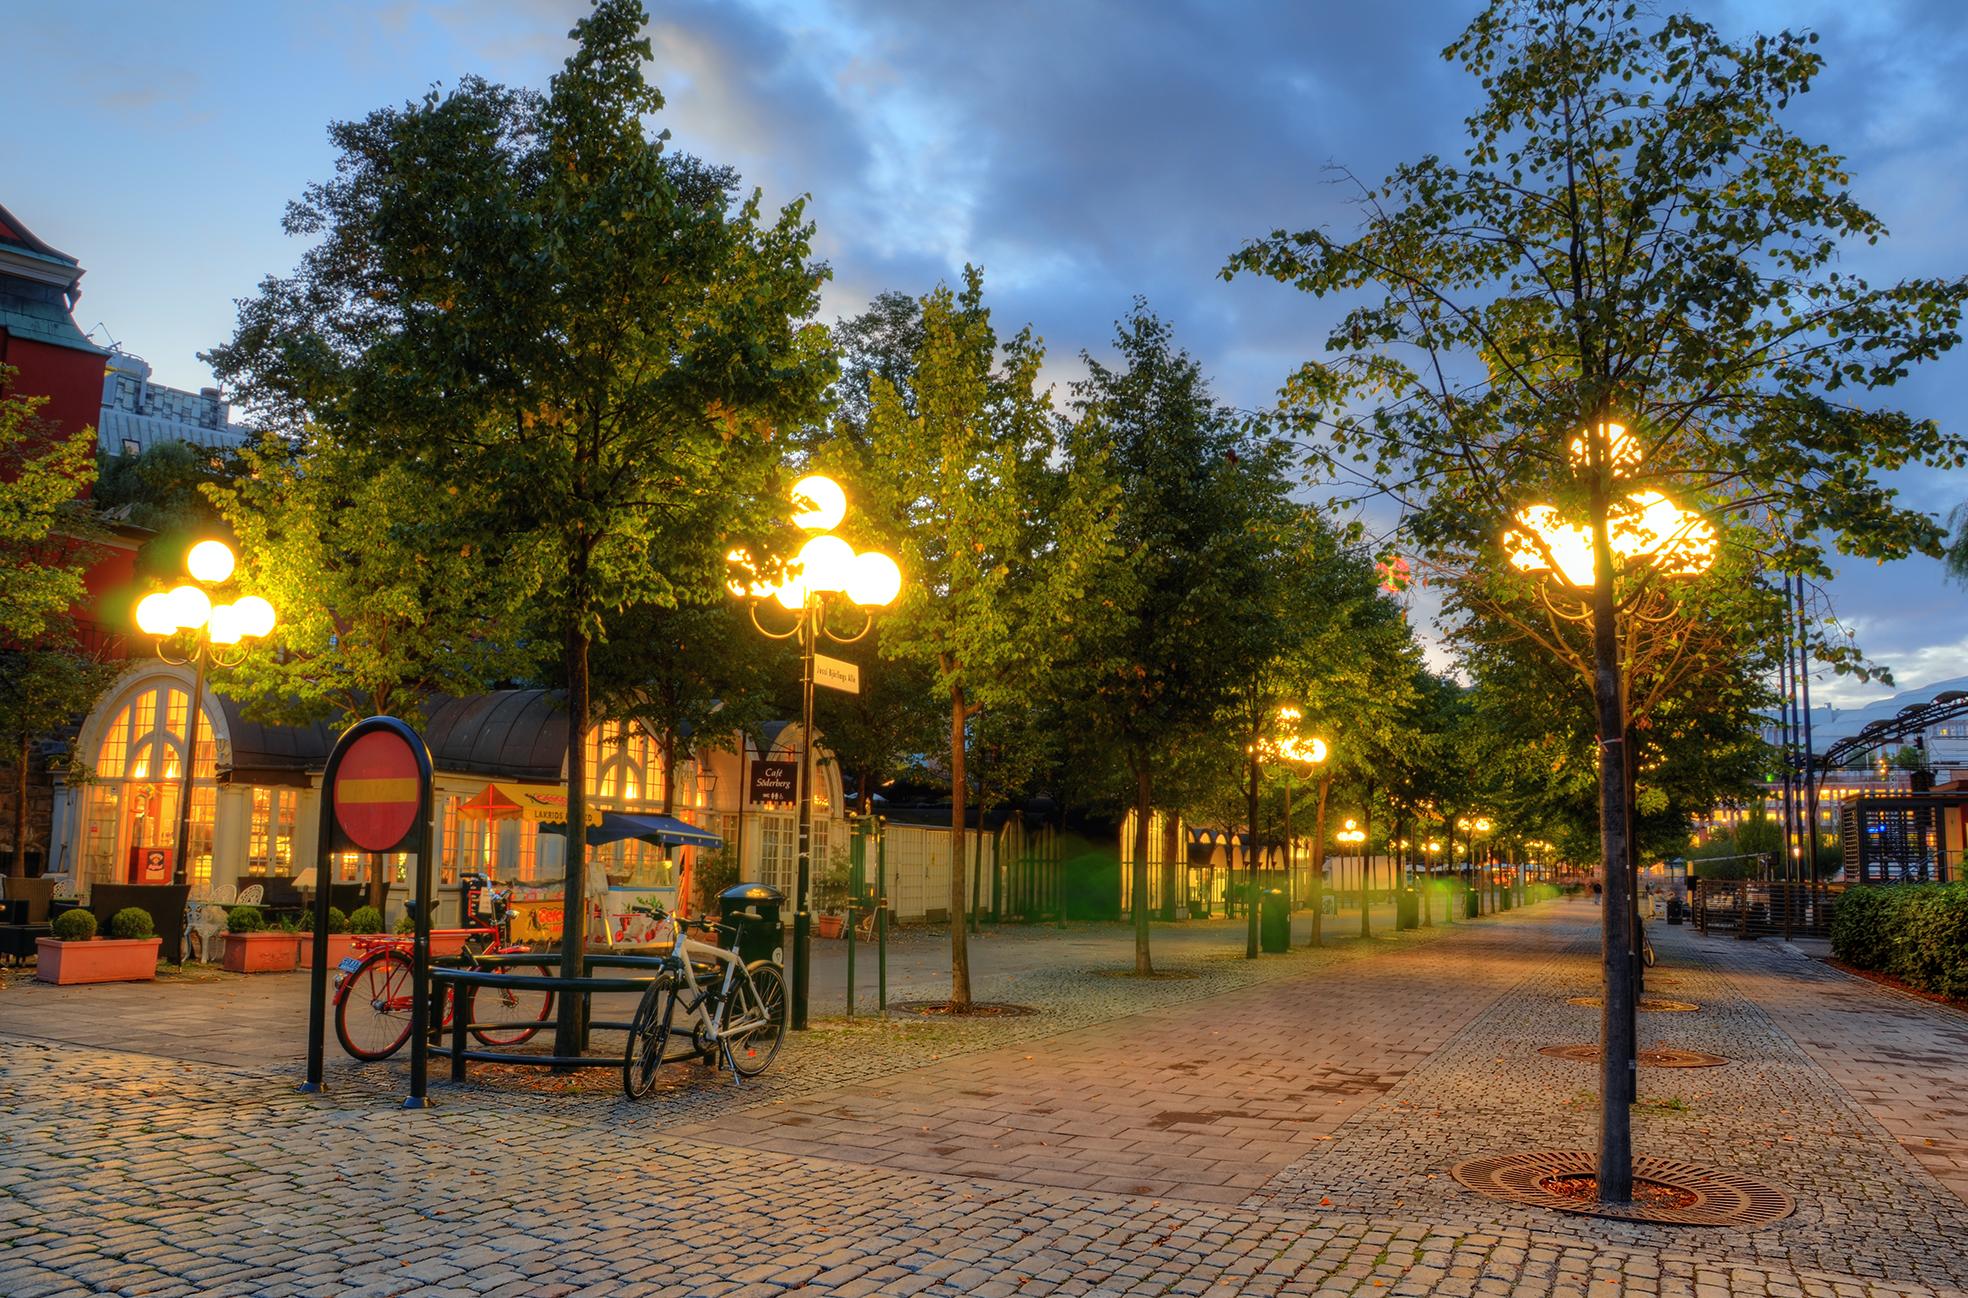 A Cobblestone Avenue by HenrikSundholm